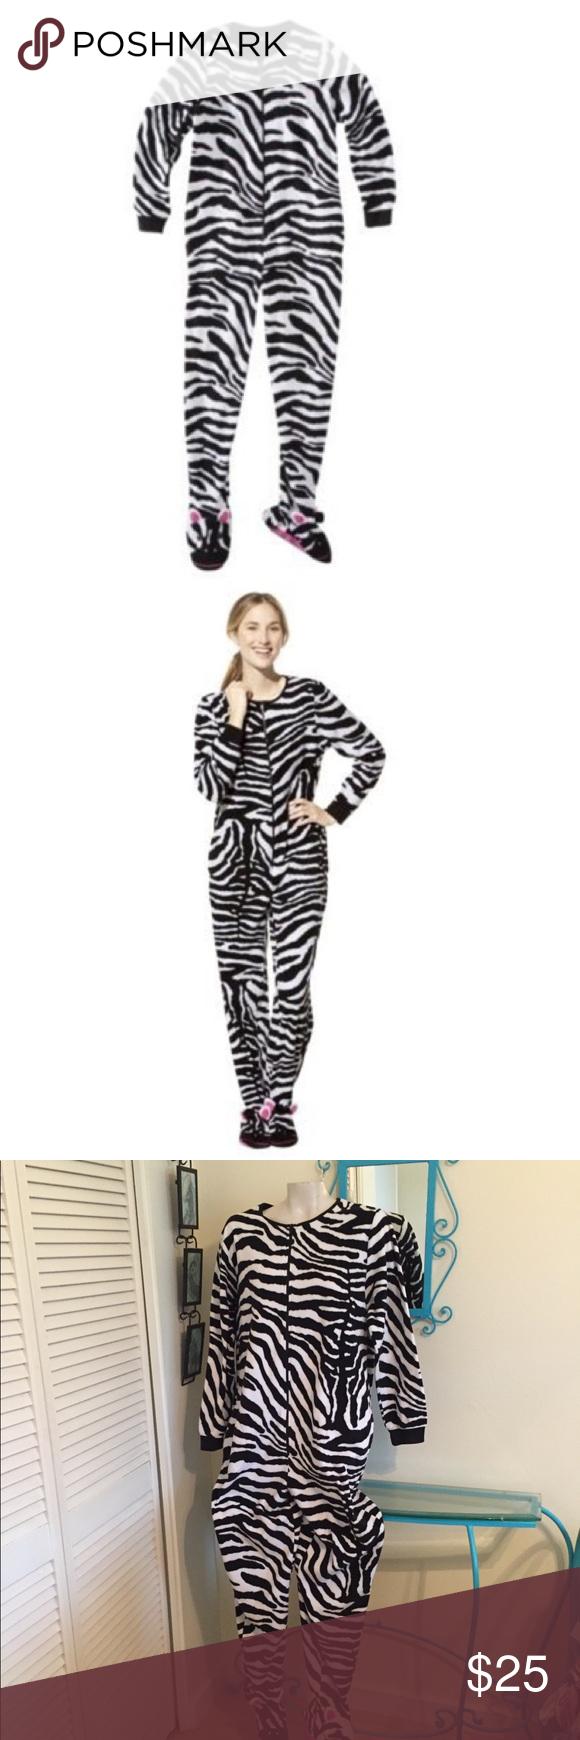 467c1b3cb7b9 Nick   Nora Fleece Zebra Footie PJ Blanket Pajama in 2018